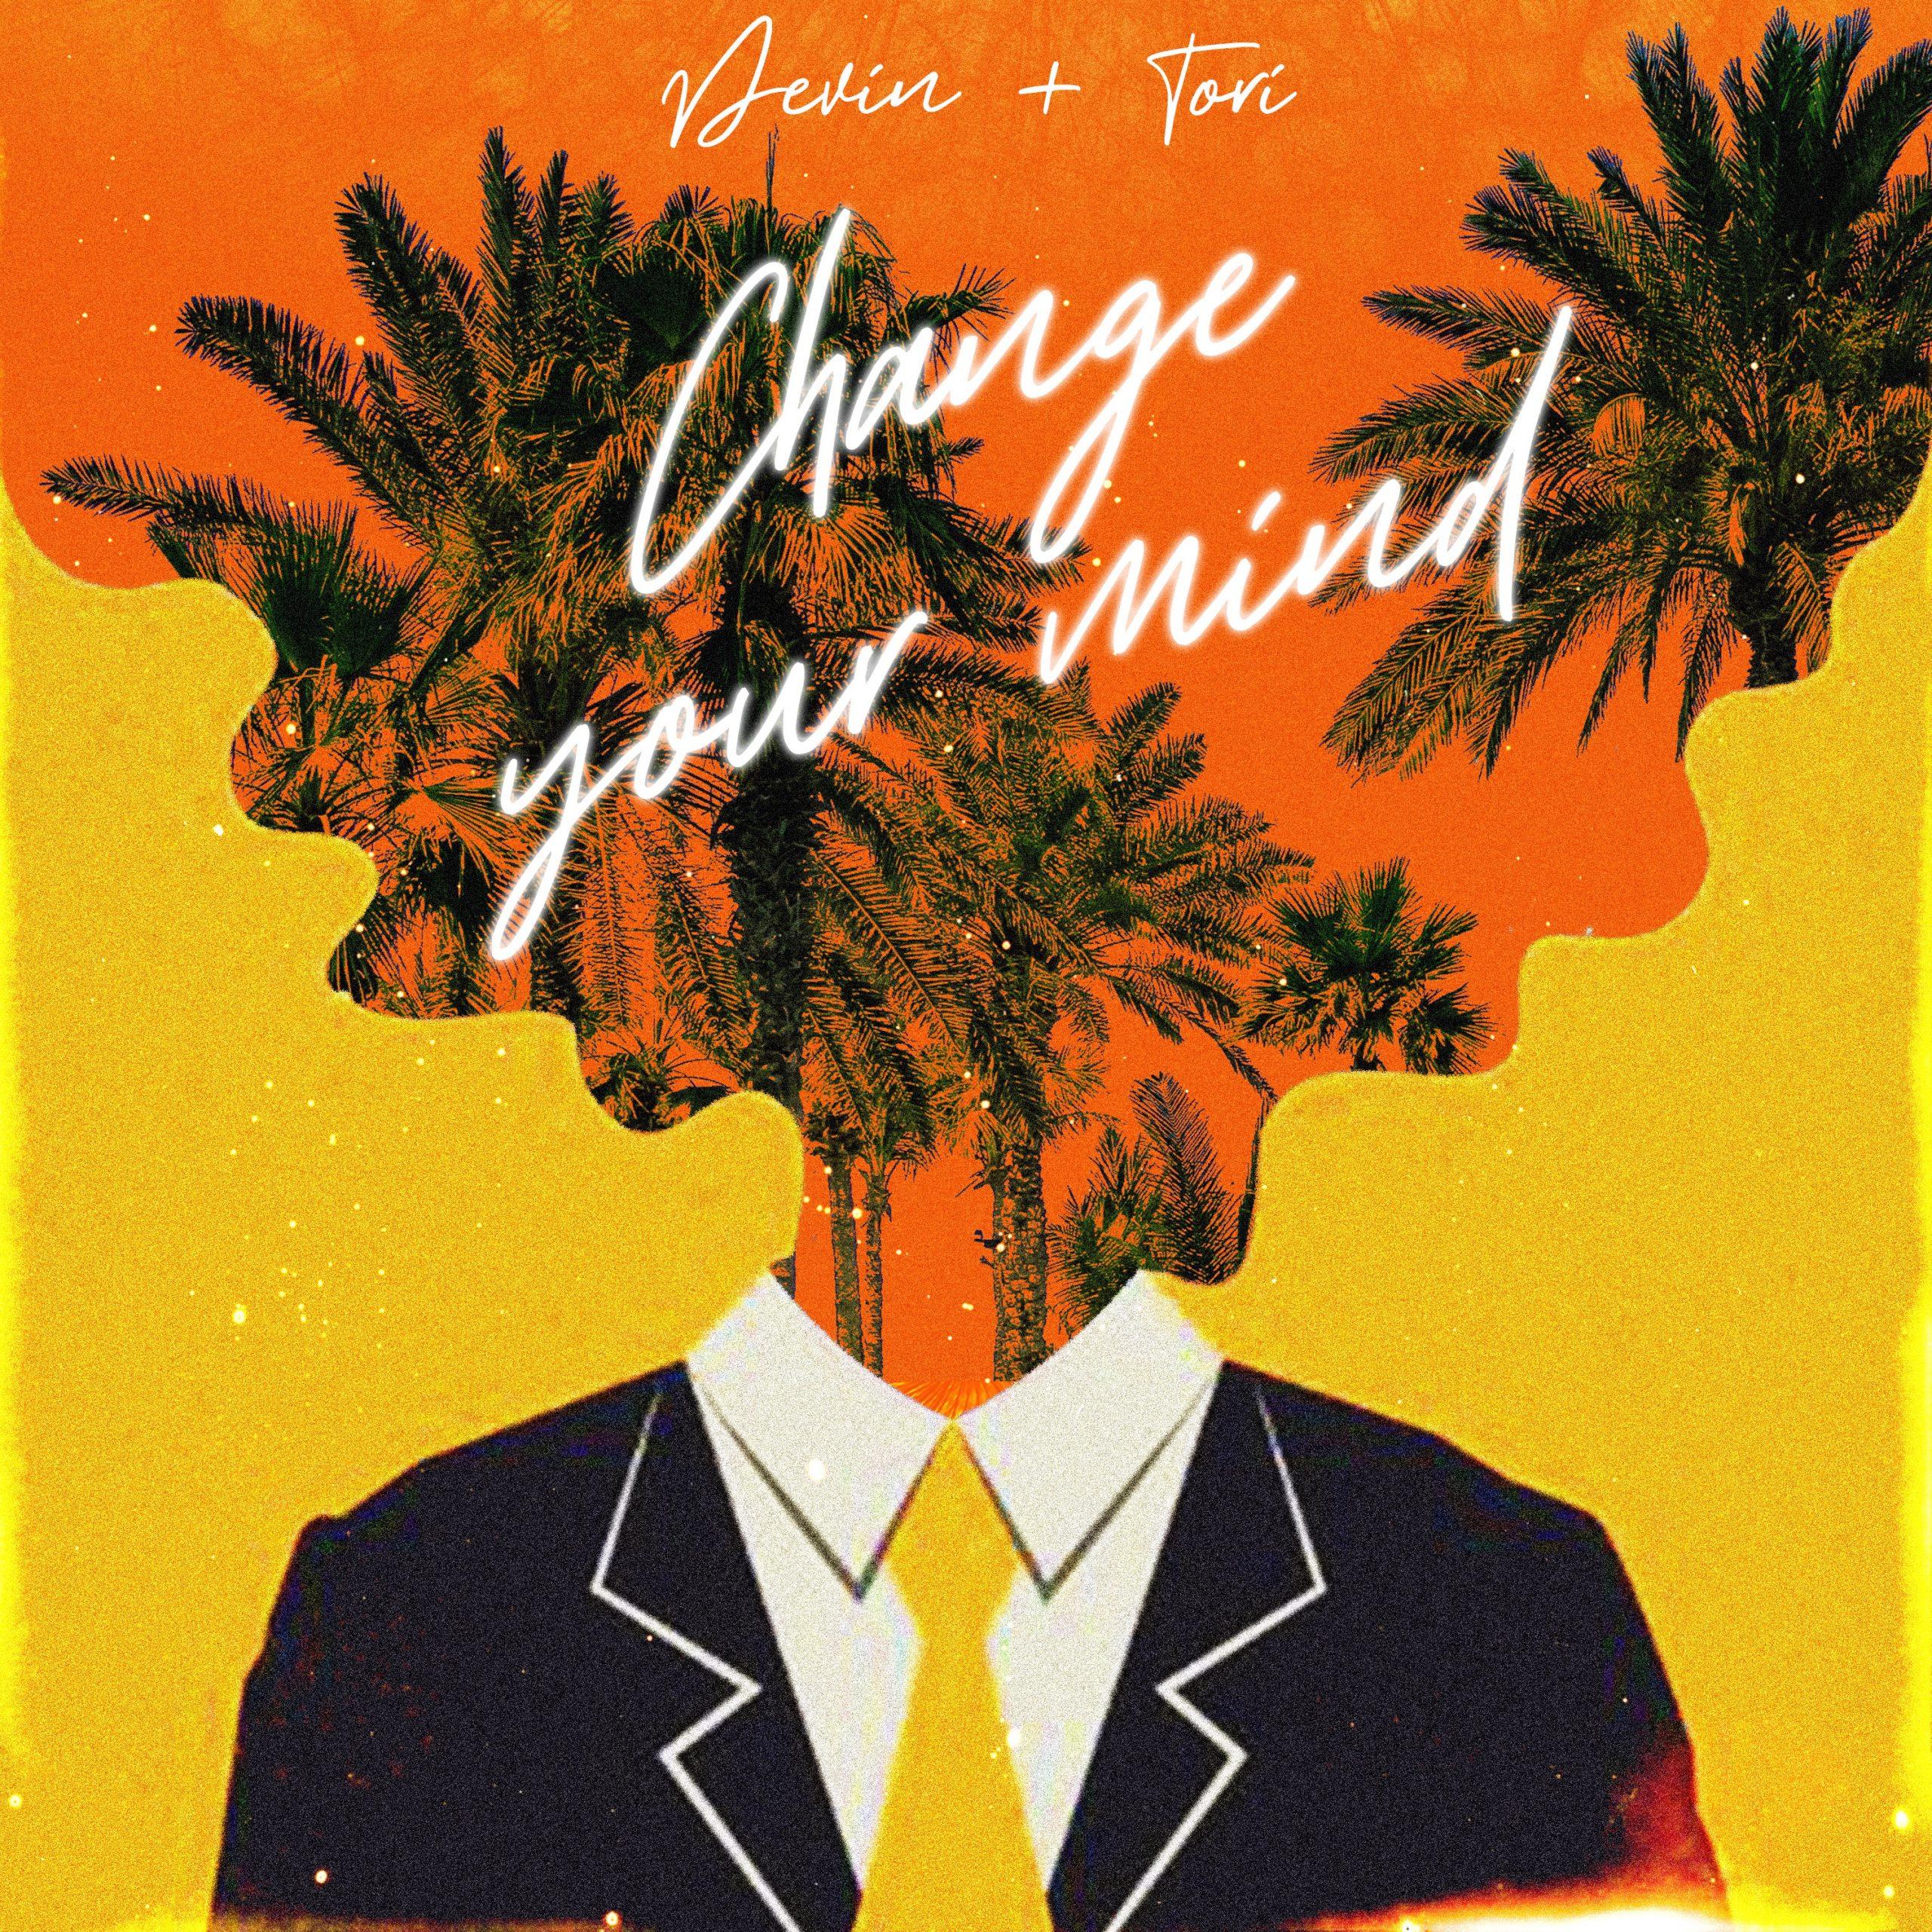 Devin + Tori – Change Your Mind